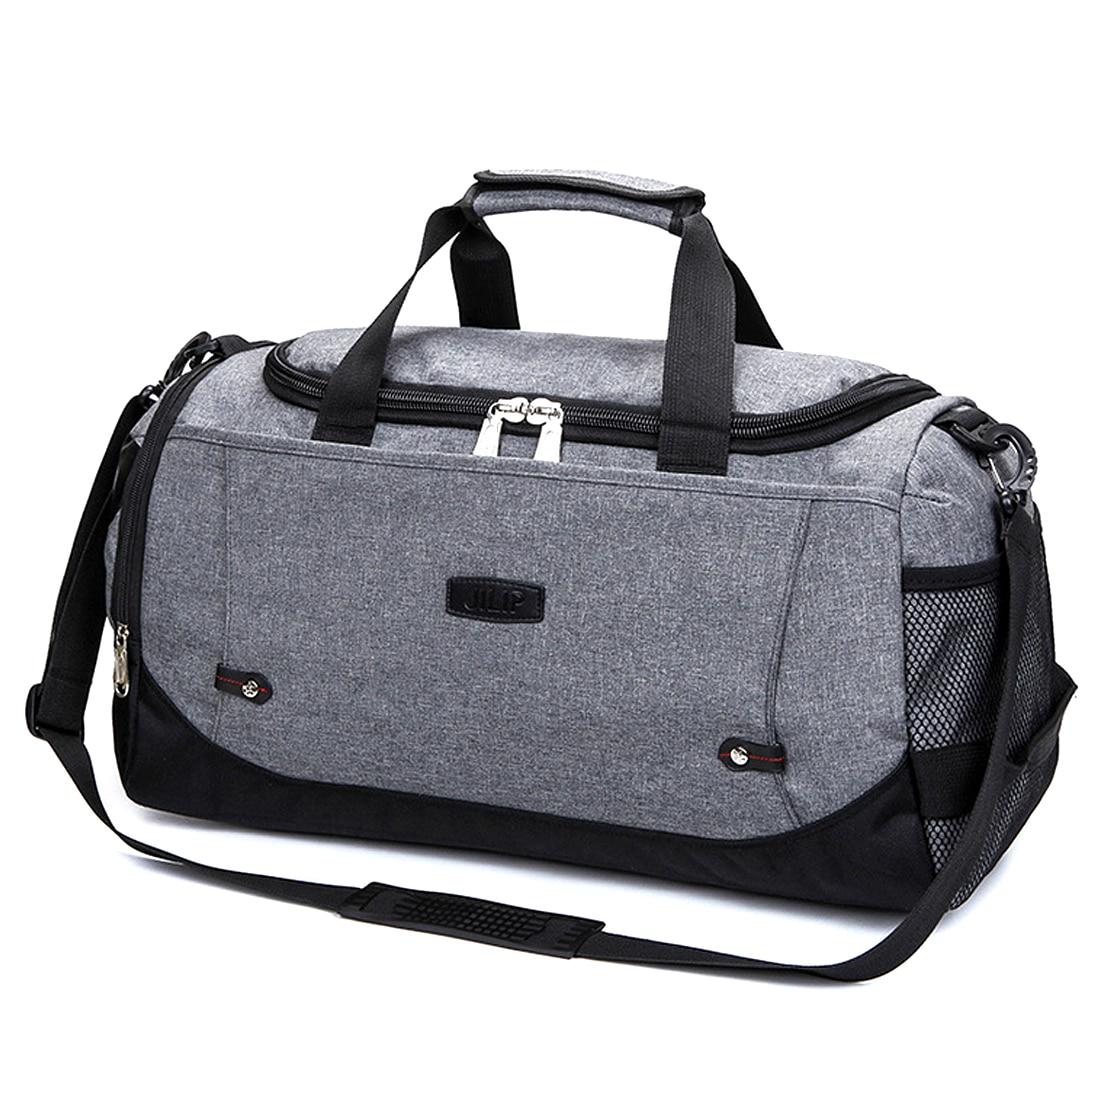 HIPSTEEN Brand Man Travel Bags Big Capacity Polyester Male Handbag Business Trip Single Shoulder Cross Body Travel Bag Hot Sale